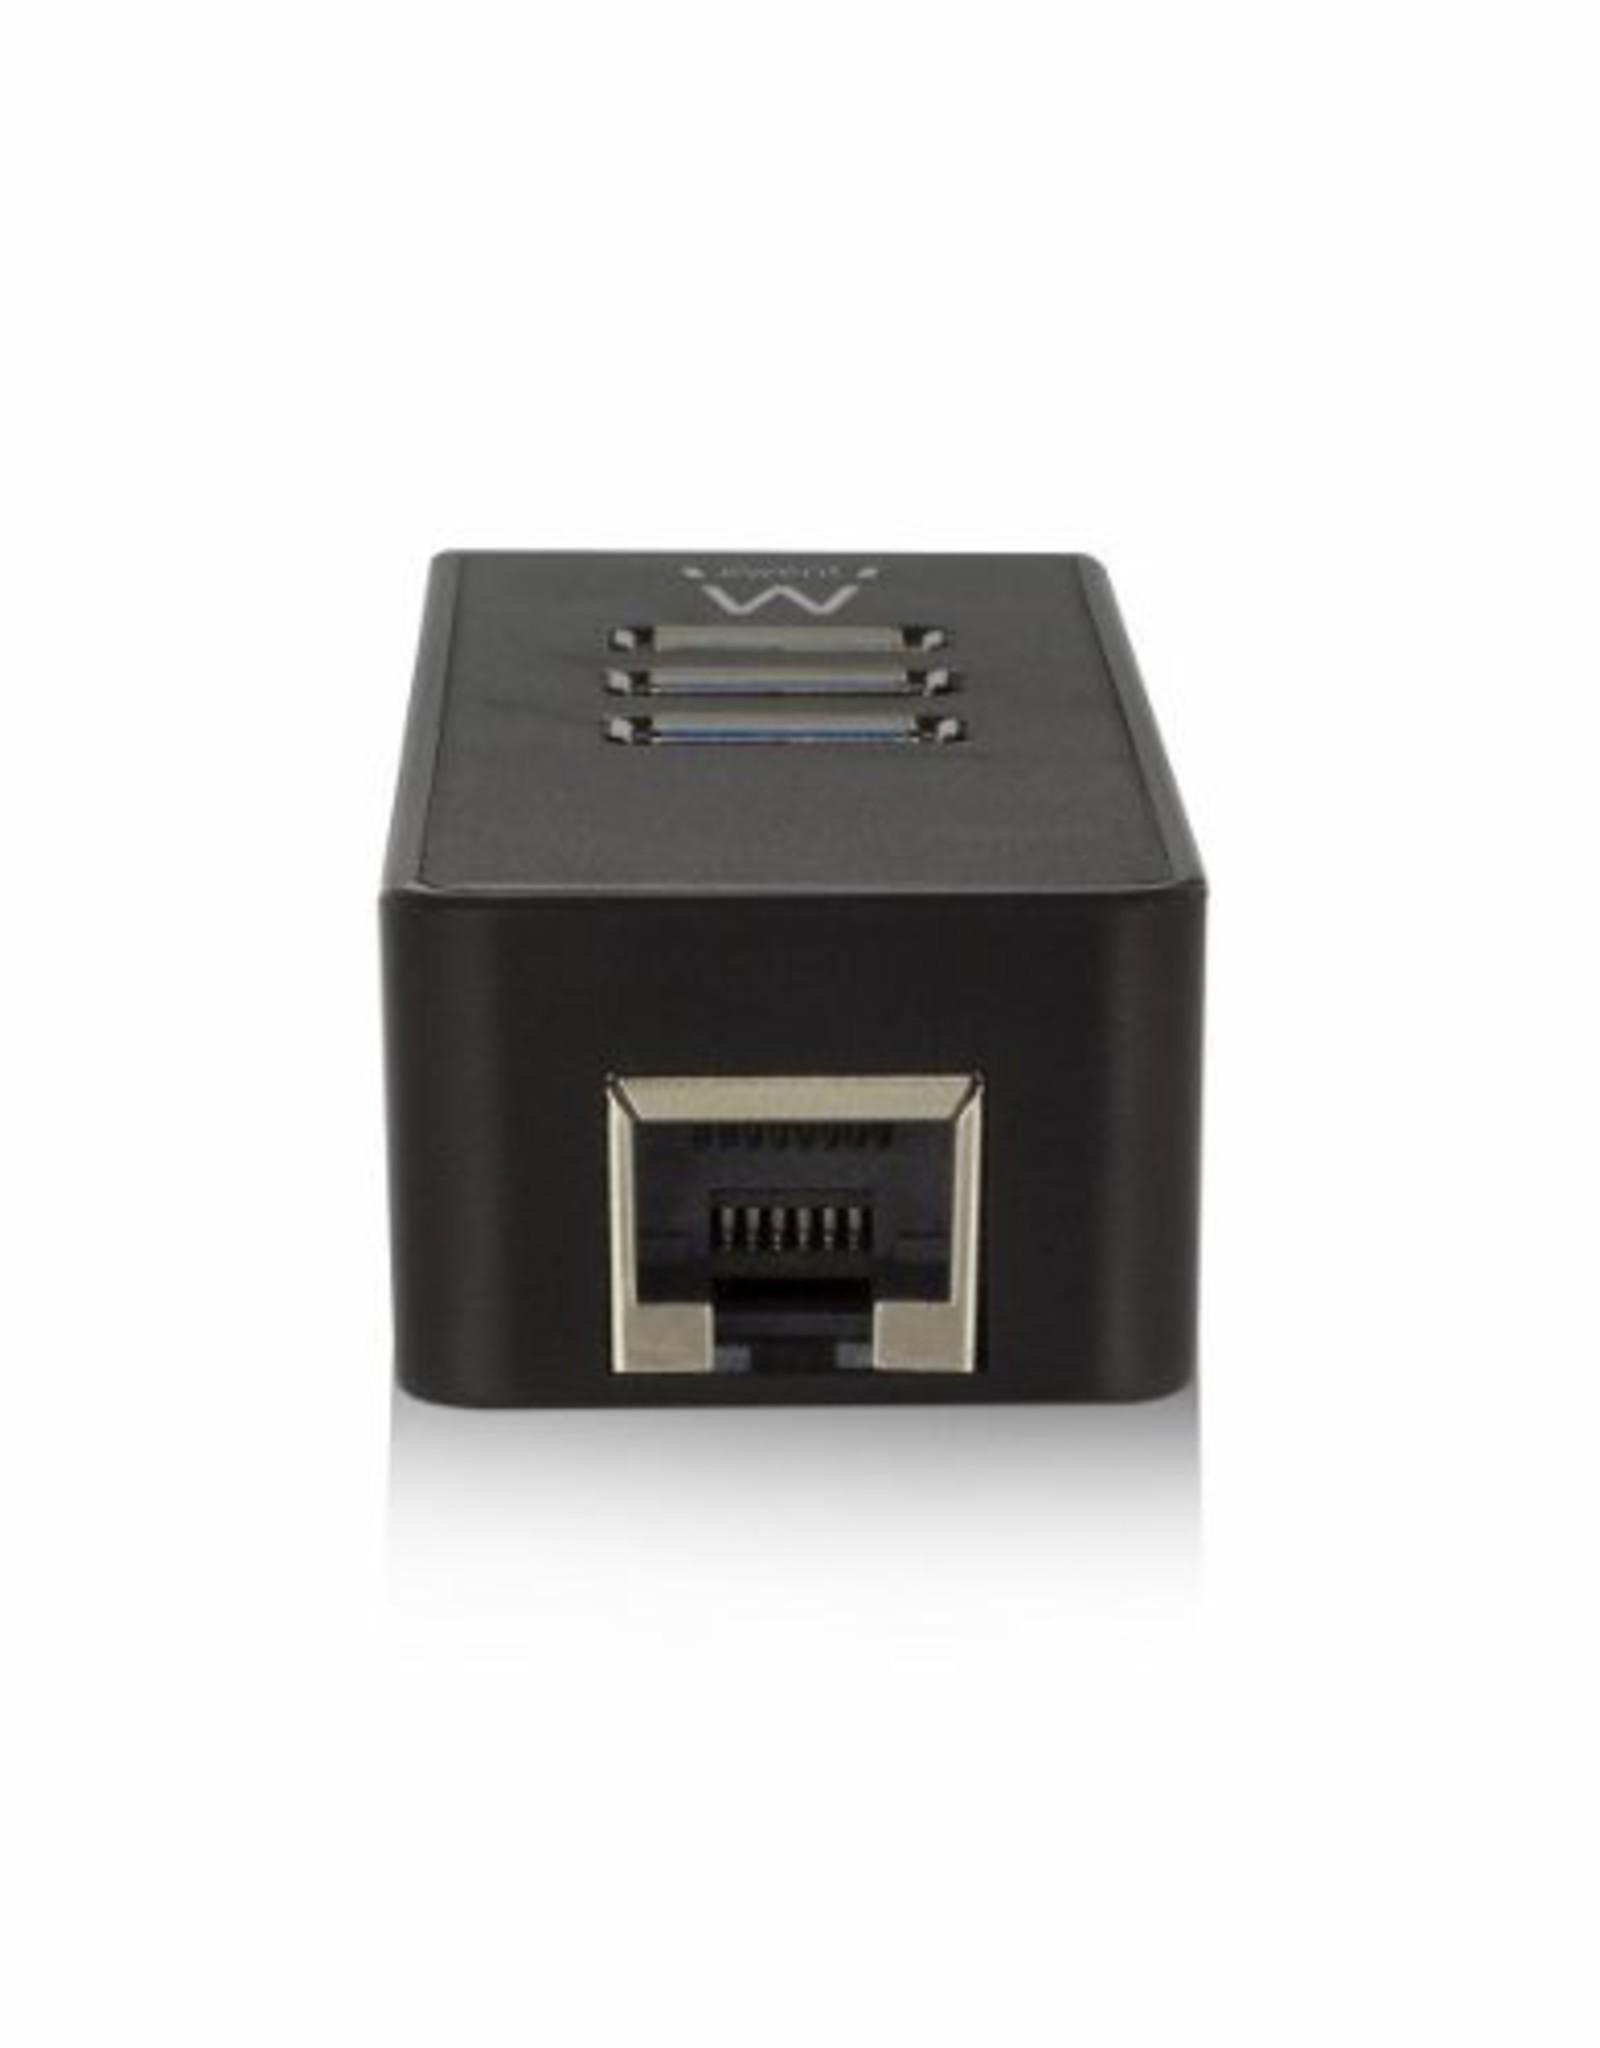 USB 3.1 Gen 1 (USB 3.0) Hub 3 port with Gigabit netw.